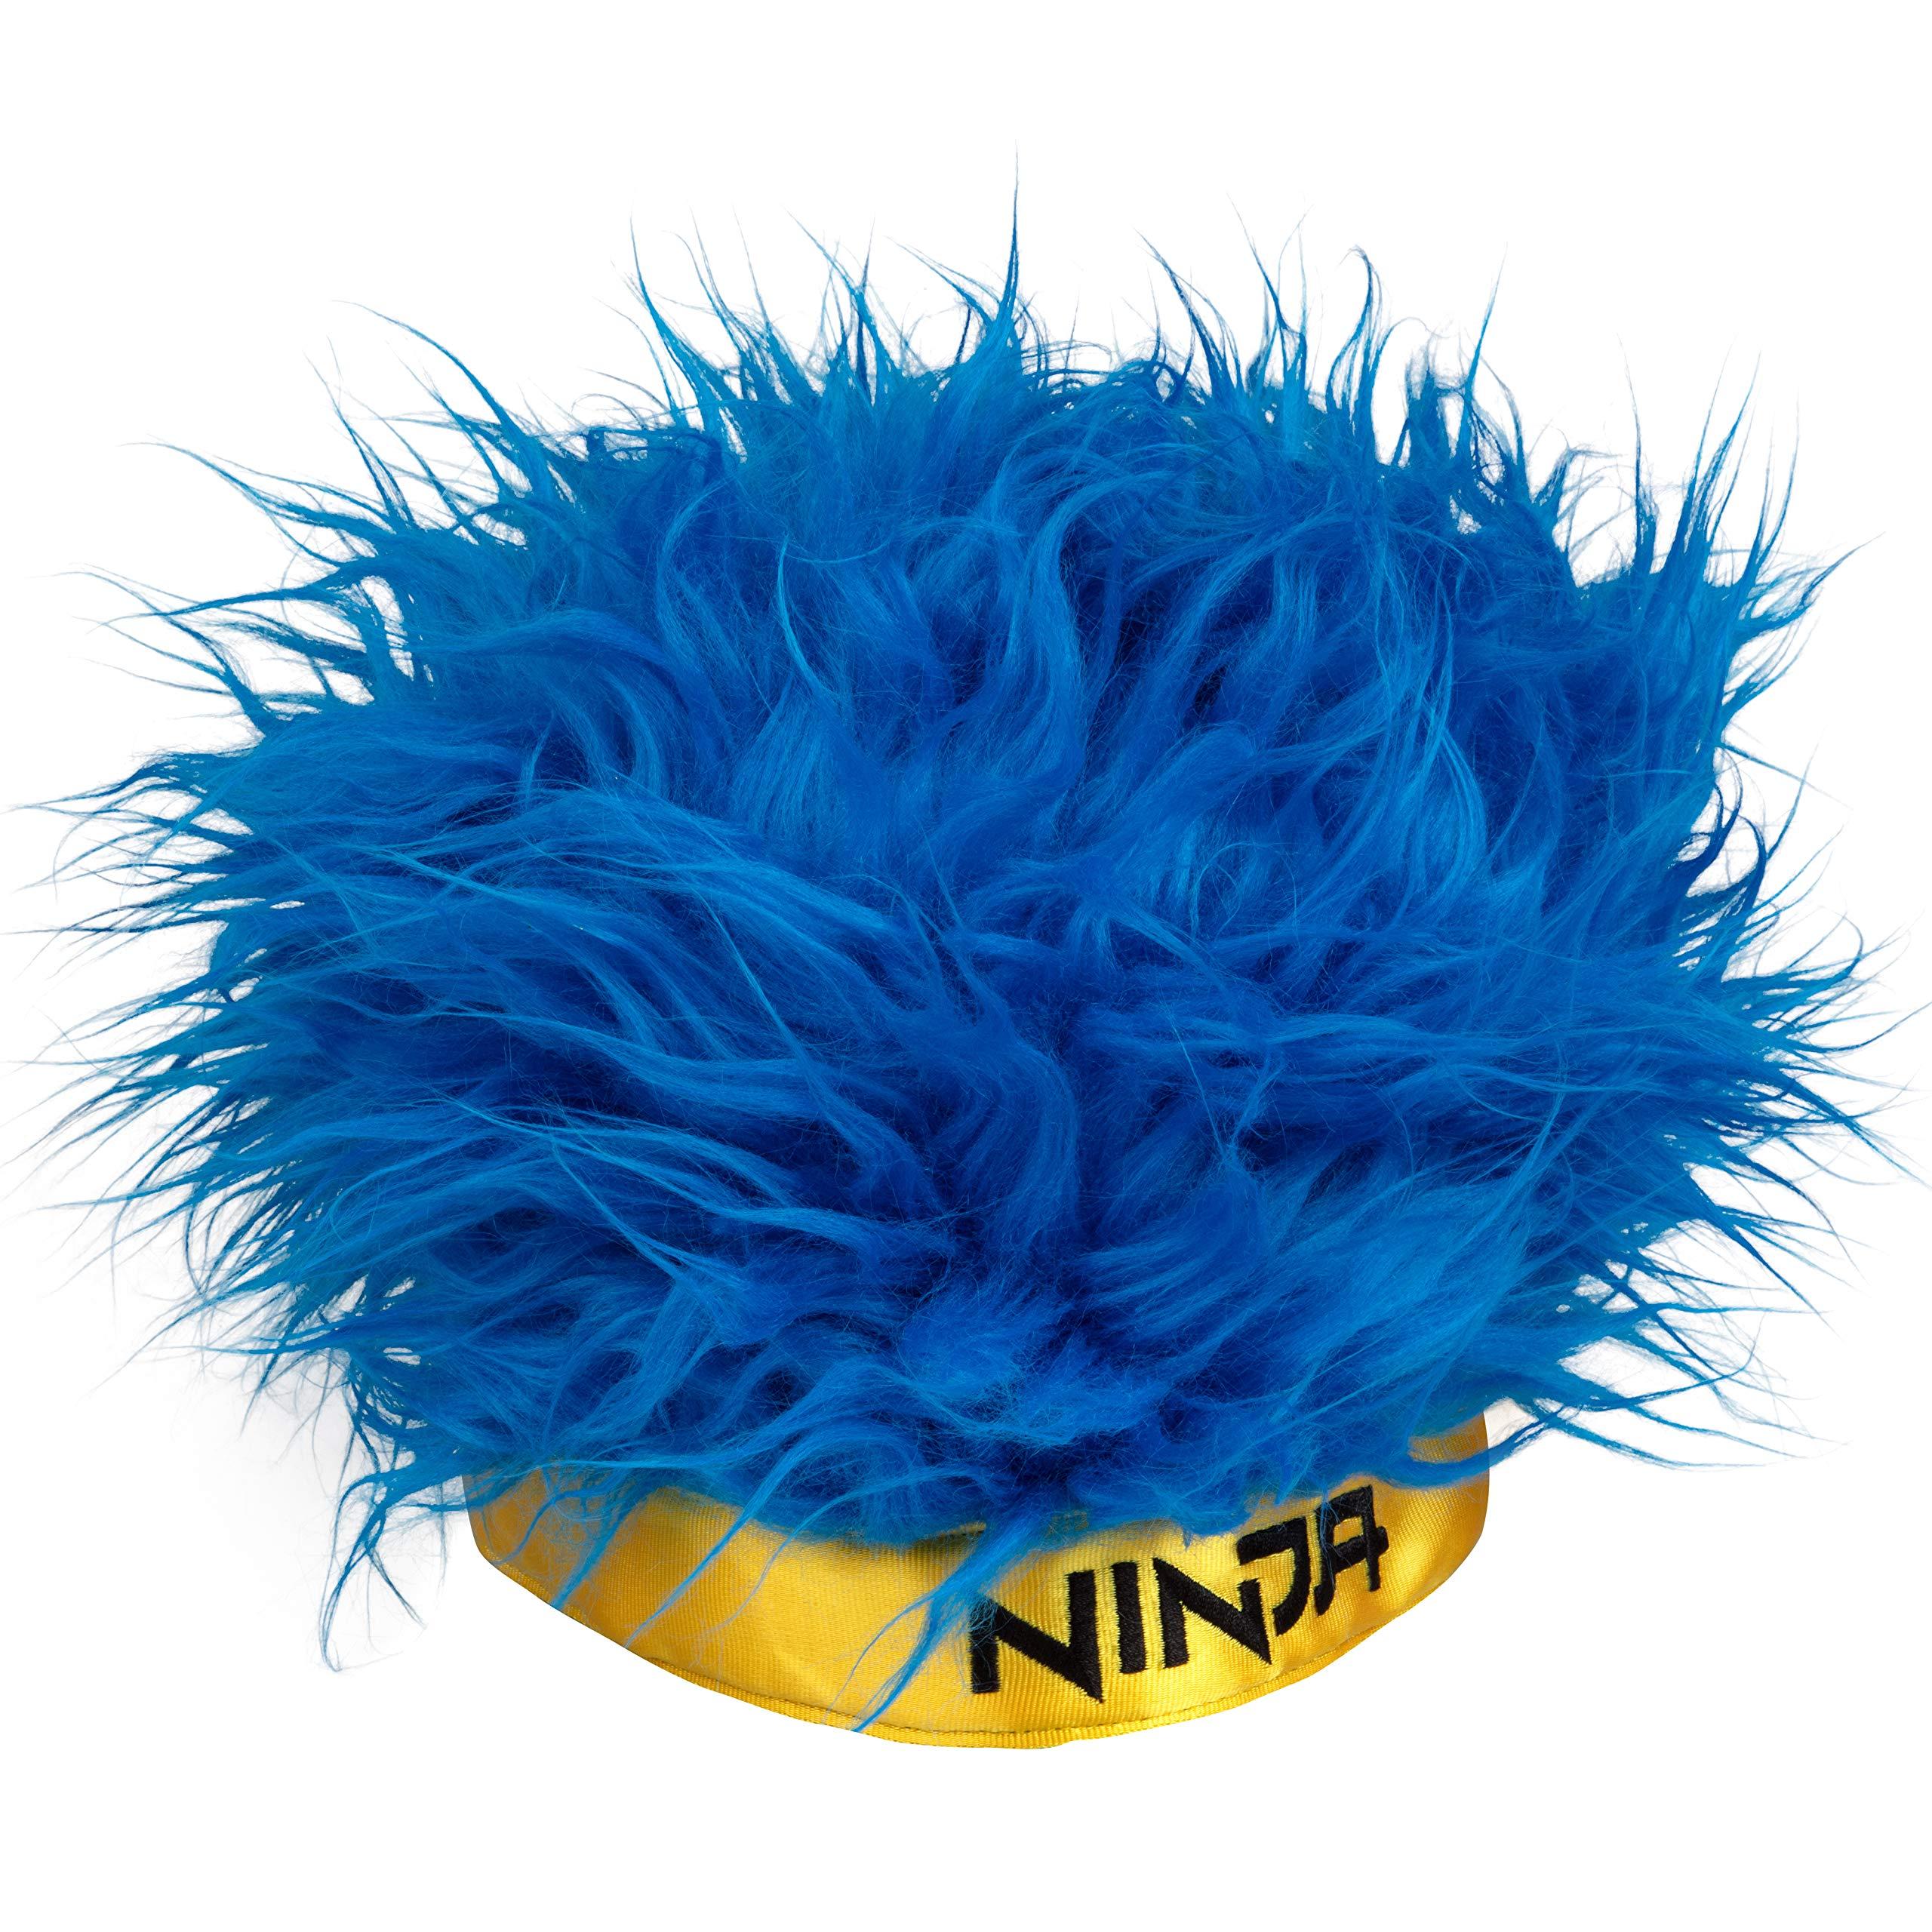 Ninja Streamer Headwear - Blue Hair Wig Hat with Yellow Ninja Headband - One Size Fits Most - 6+